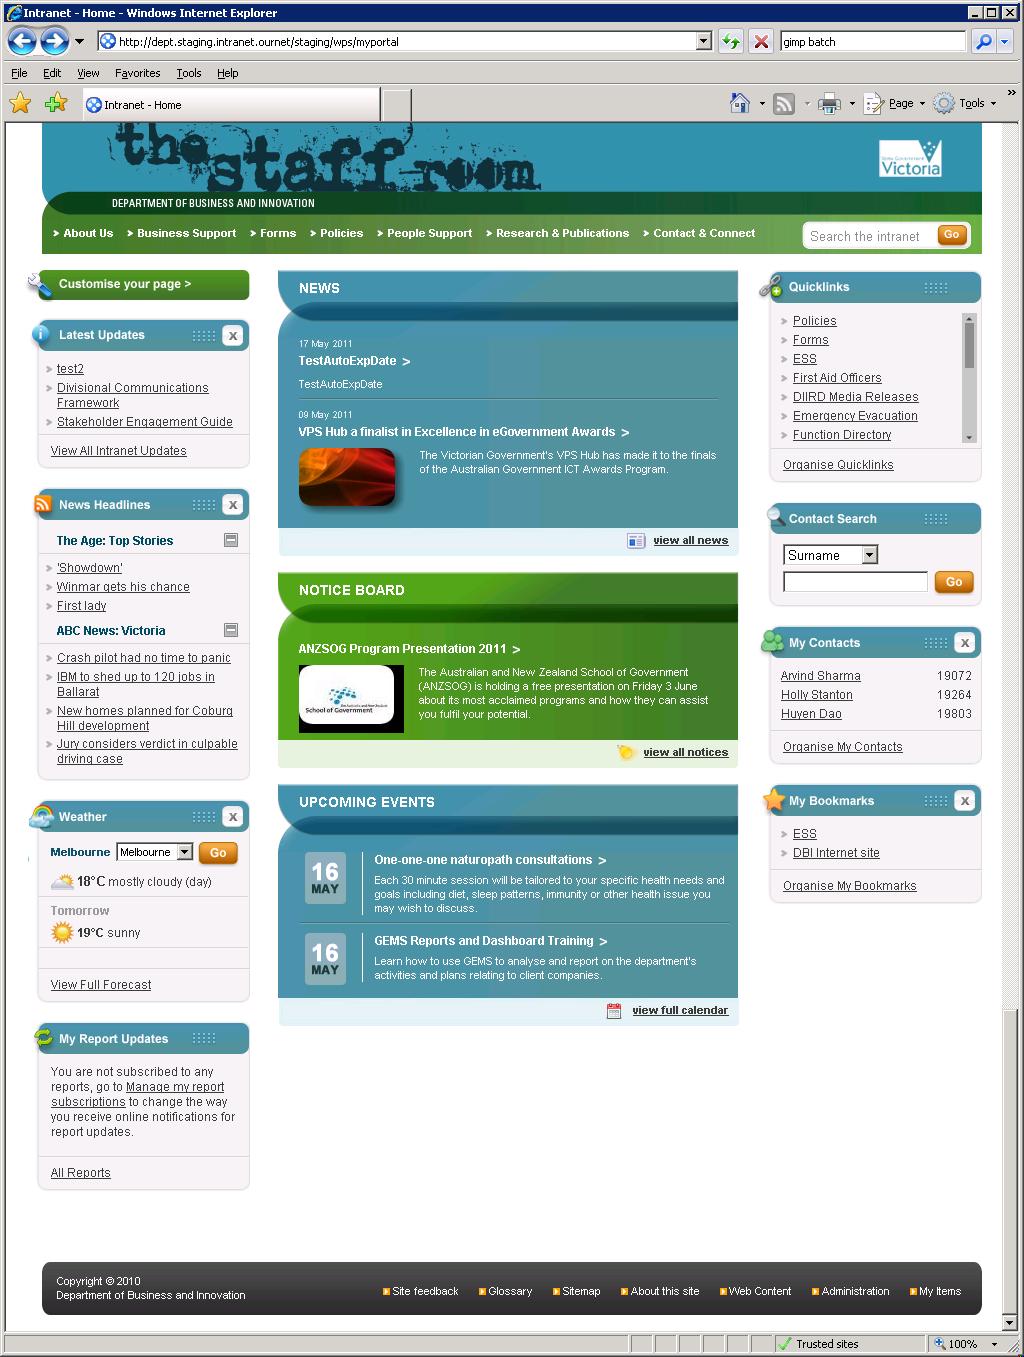 DBI Intranet : layout mods